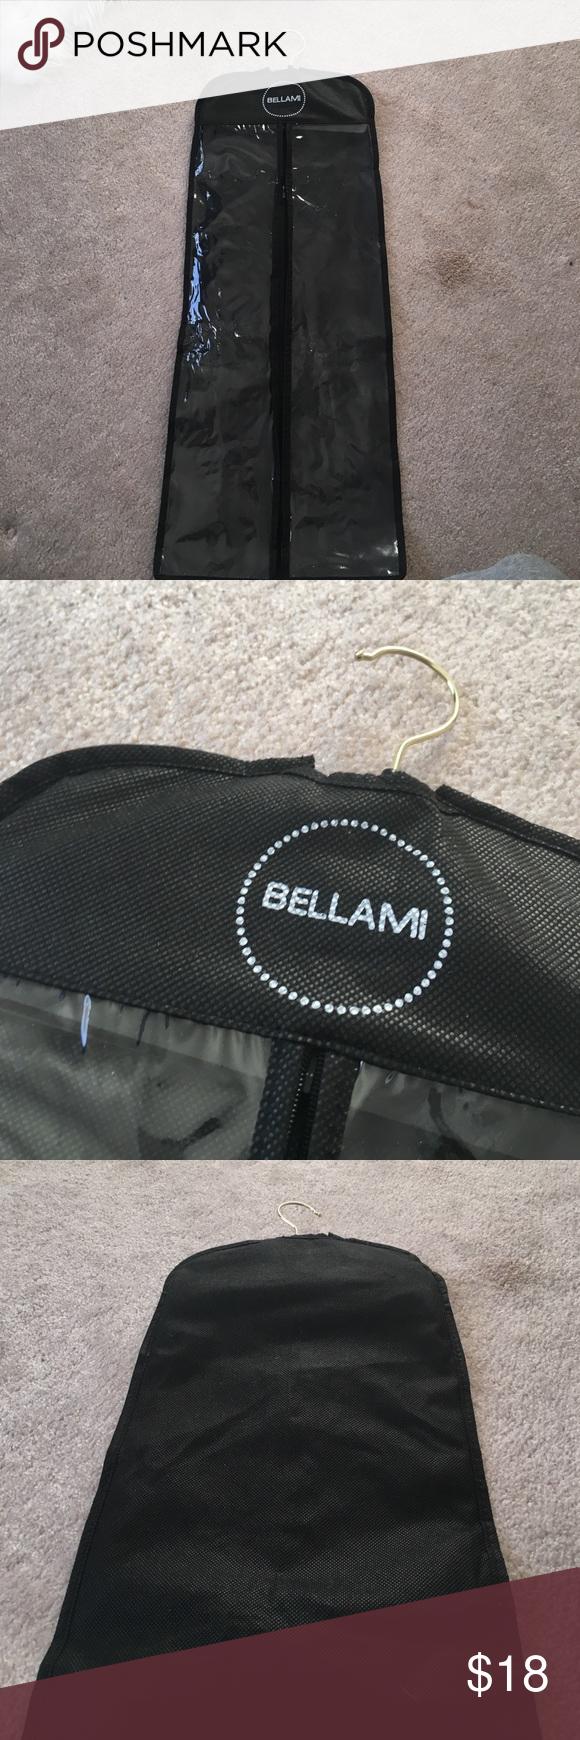 Bellami Hair Extension Holder And Hanger As Seen On The Bellami Hair